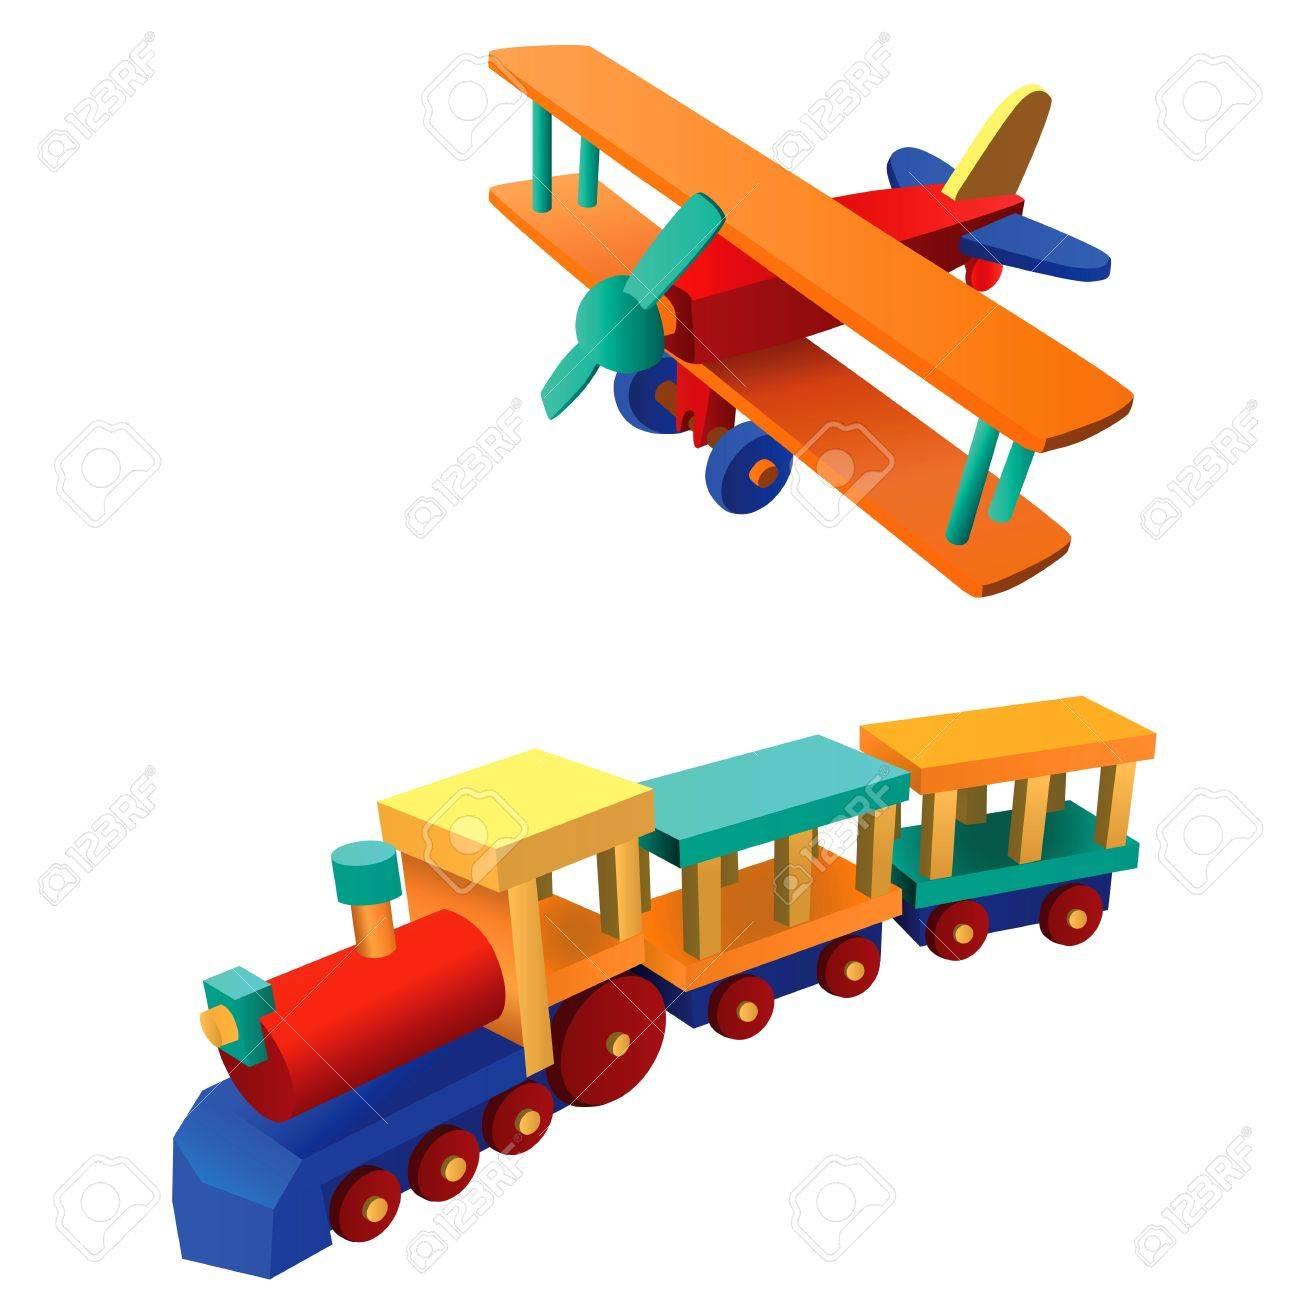 toy illustration Stock Vector - 9247525